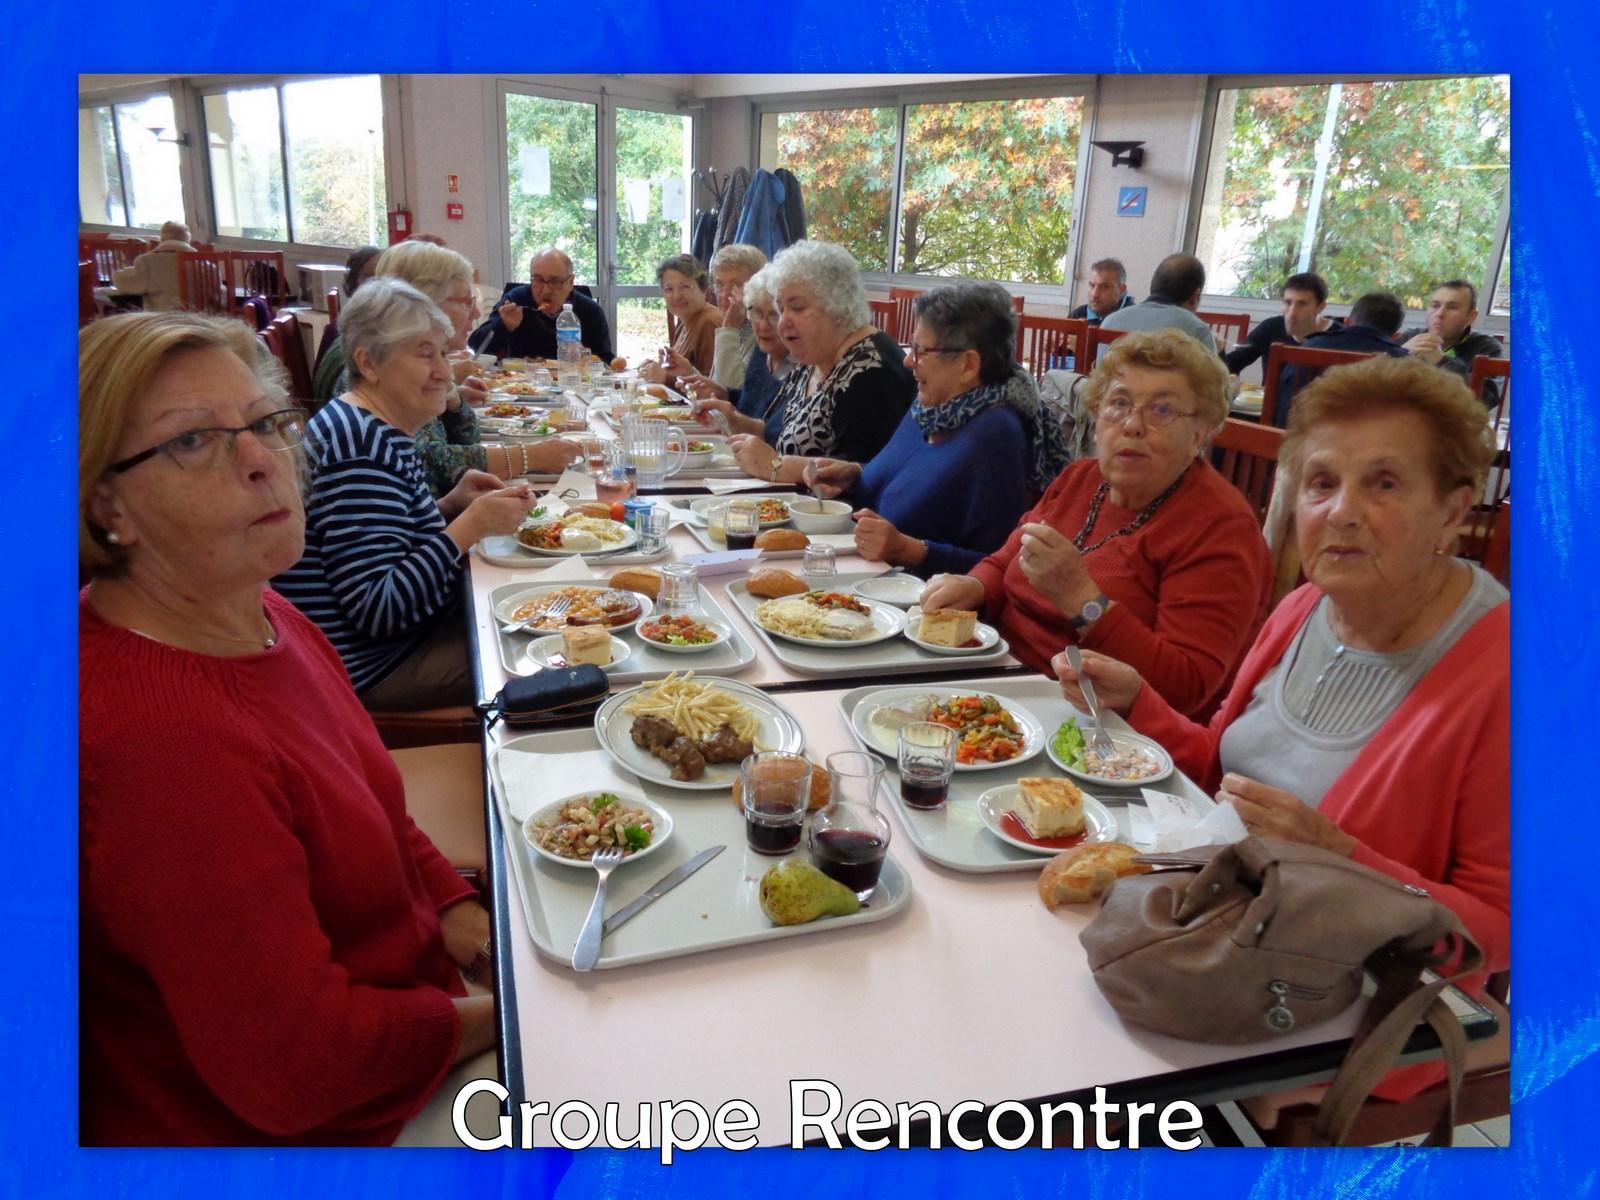 Groupe Rencontre (3)